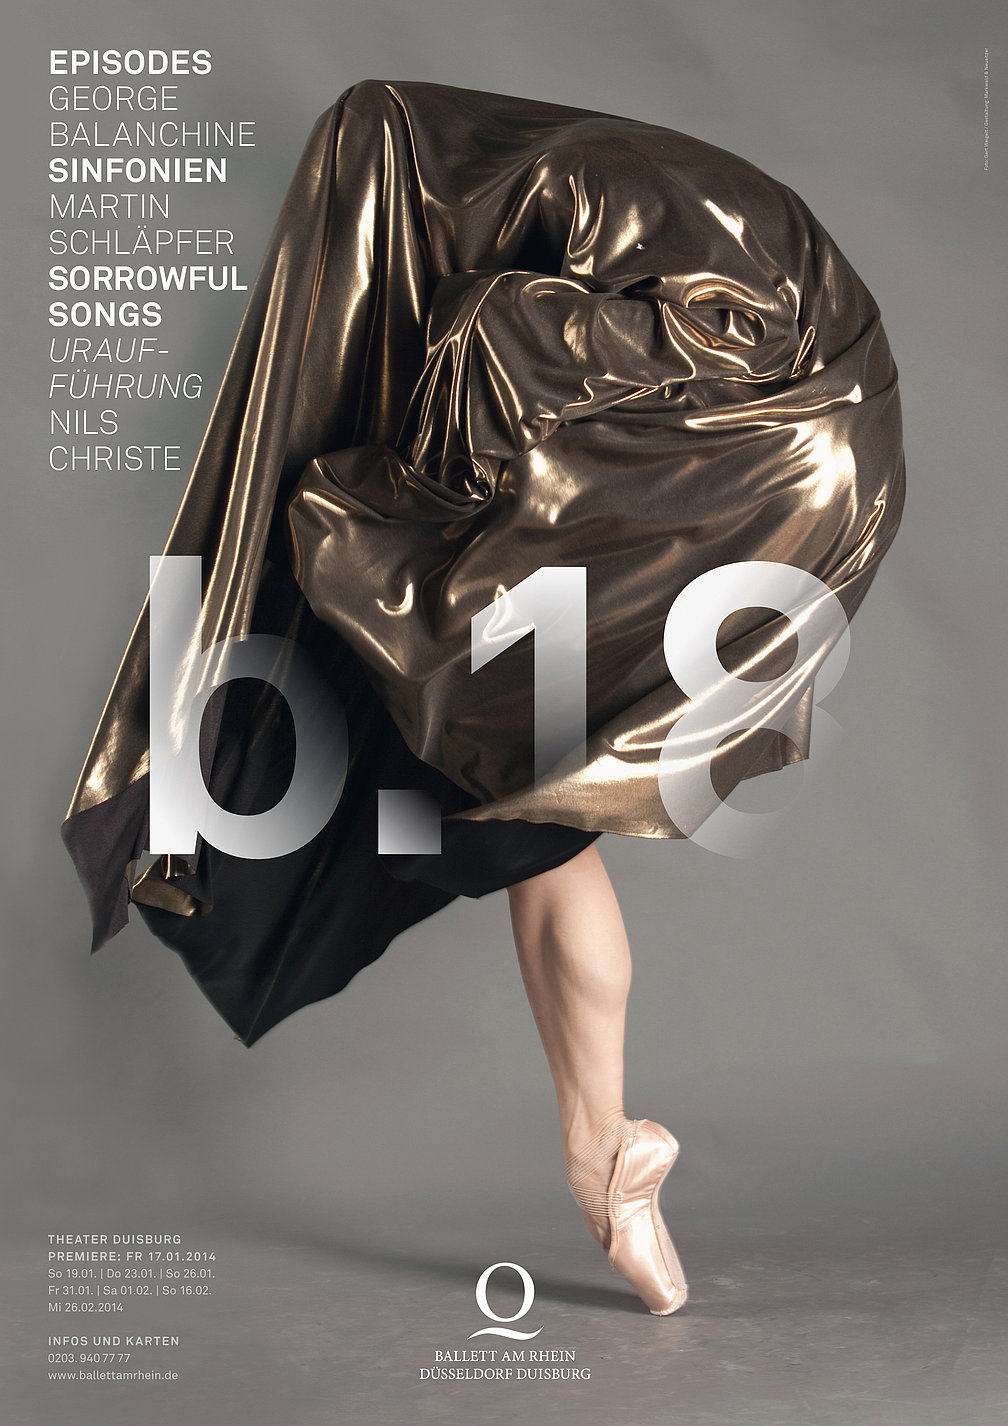 Ballett am Rhein Season 2013/2014 | Red Dot Design Award